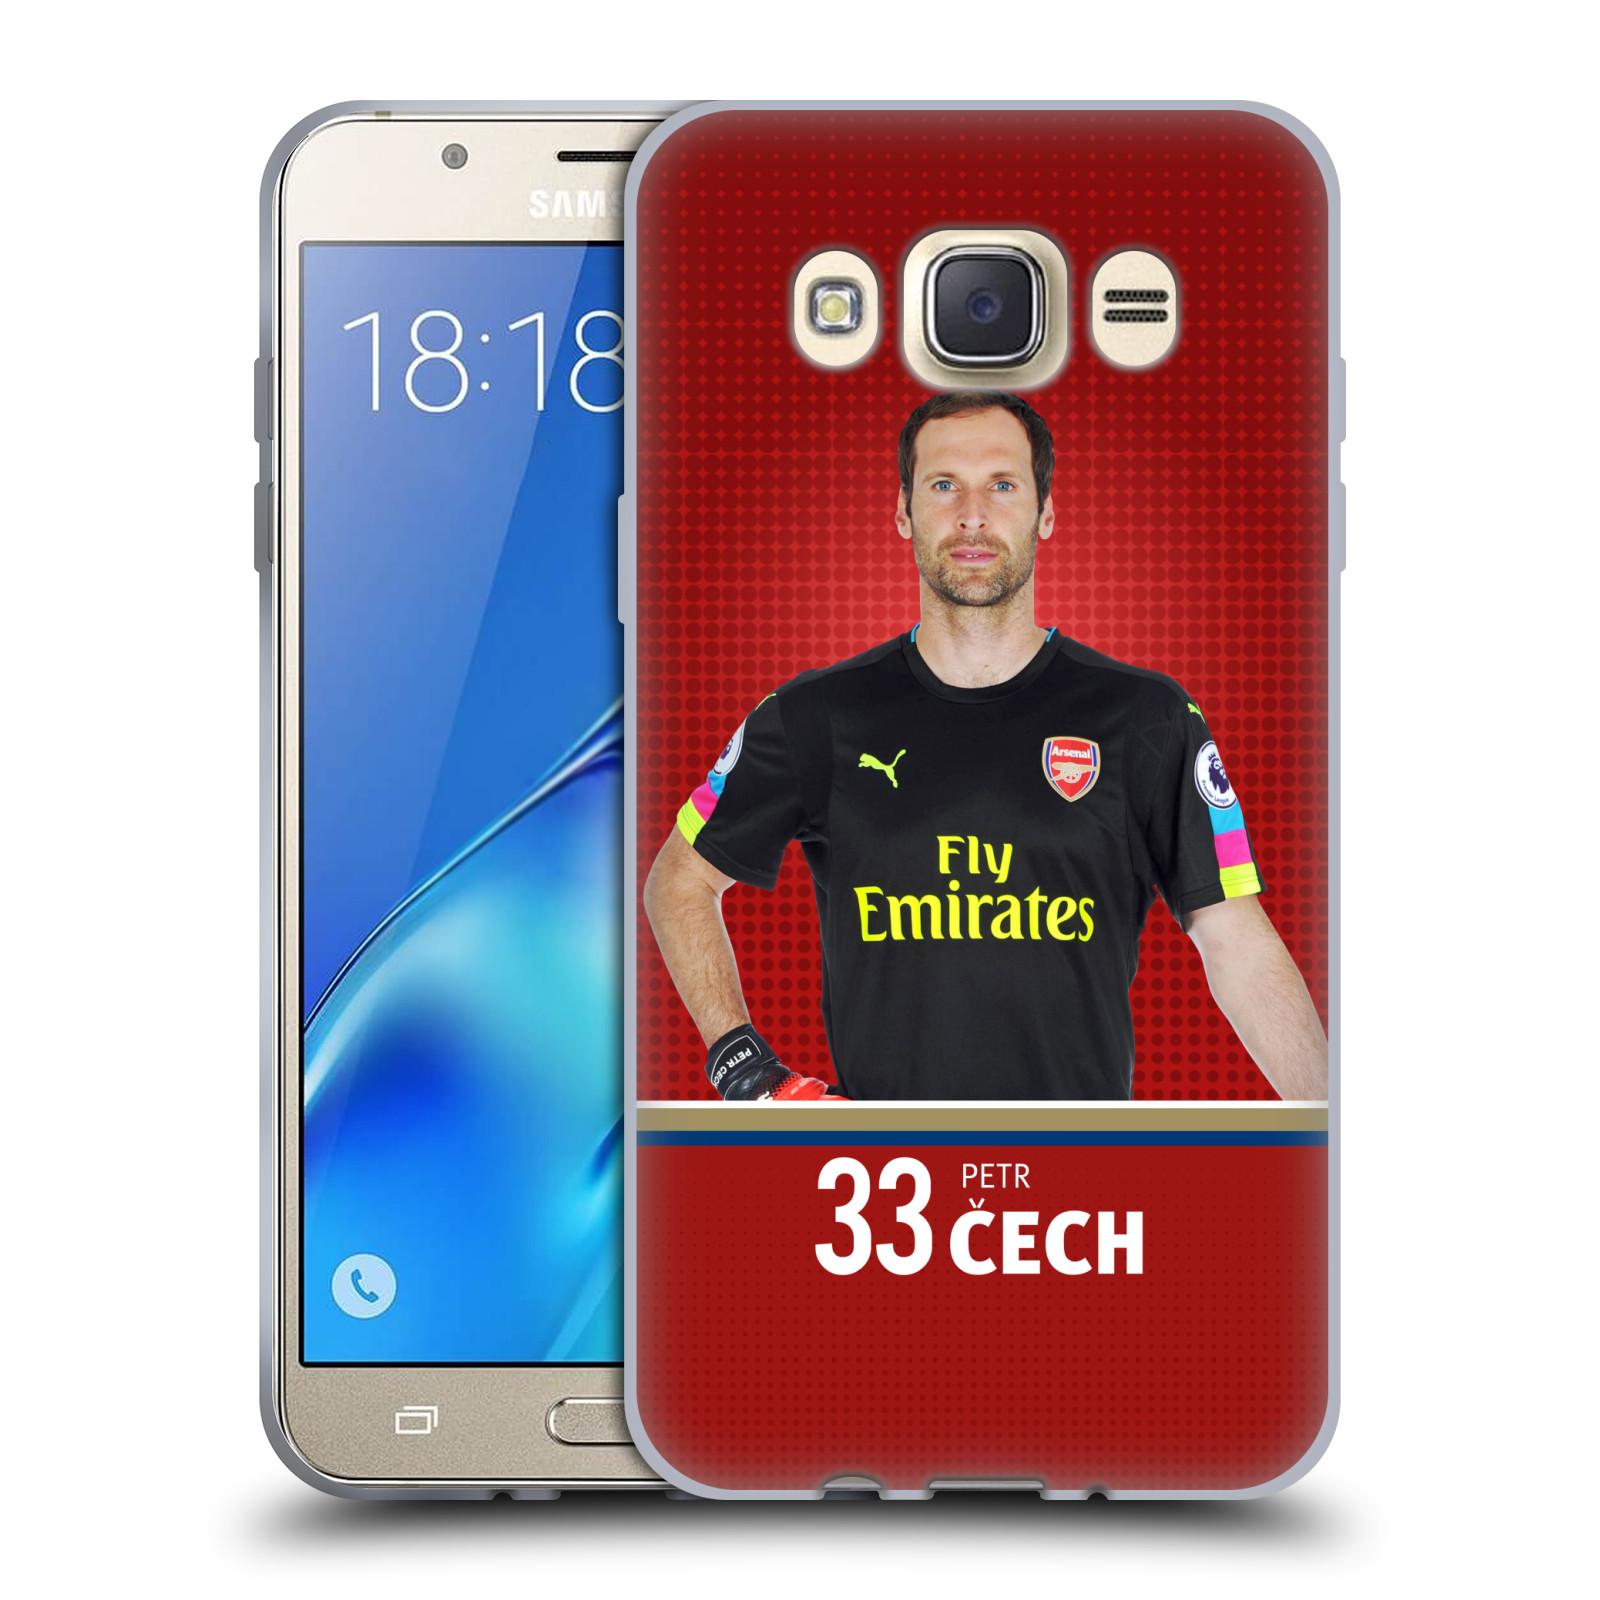 Silikonové pouzdro na mobil Samsung Galaxy J7 (2016) - Head Case - Arsenal FC - Petr Čech